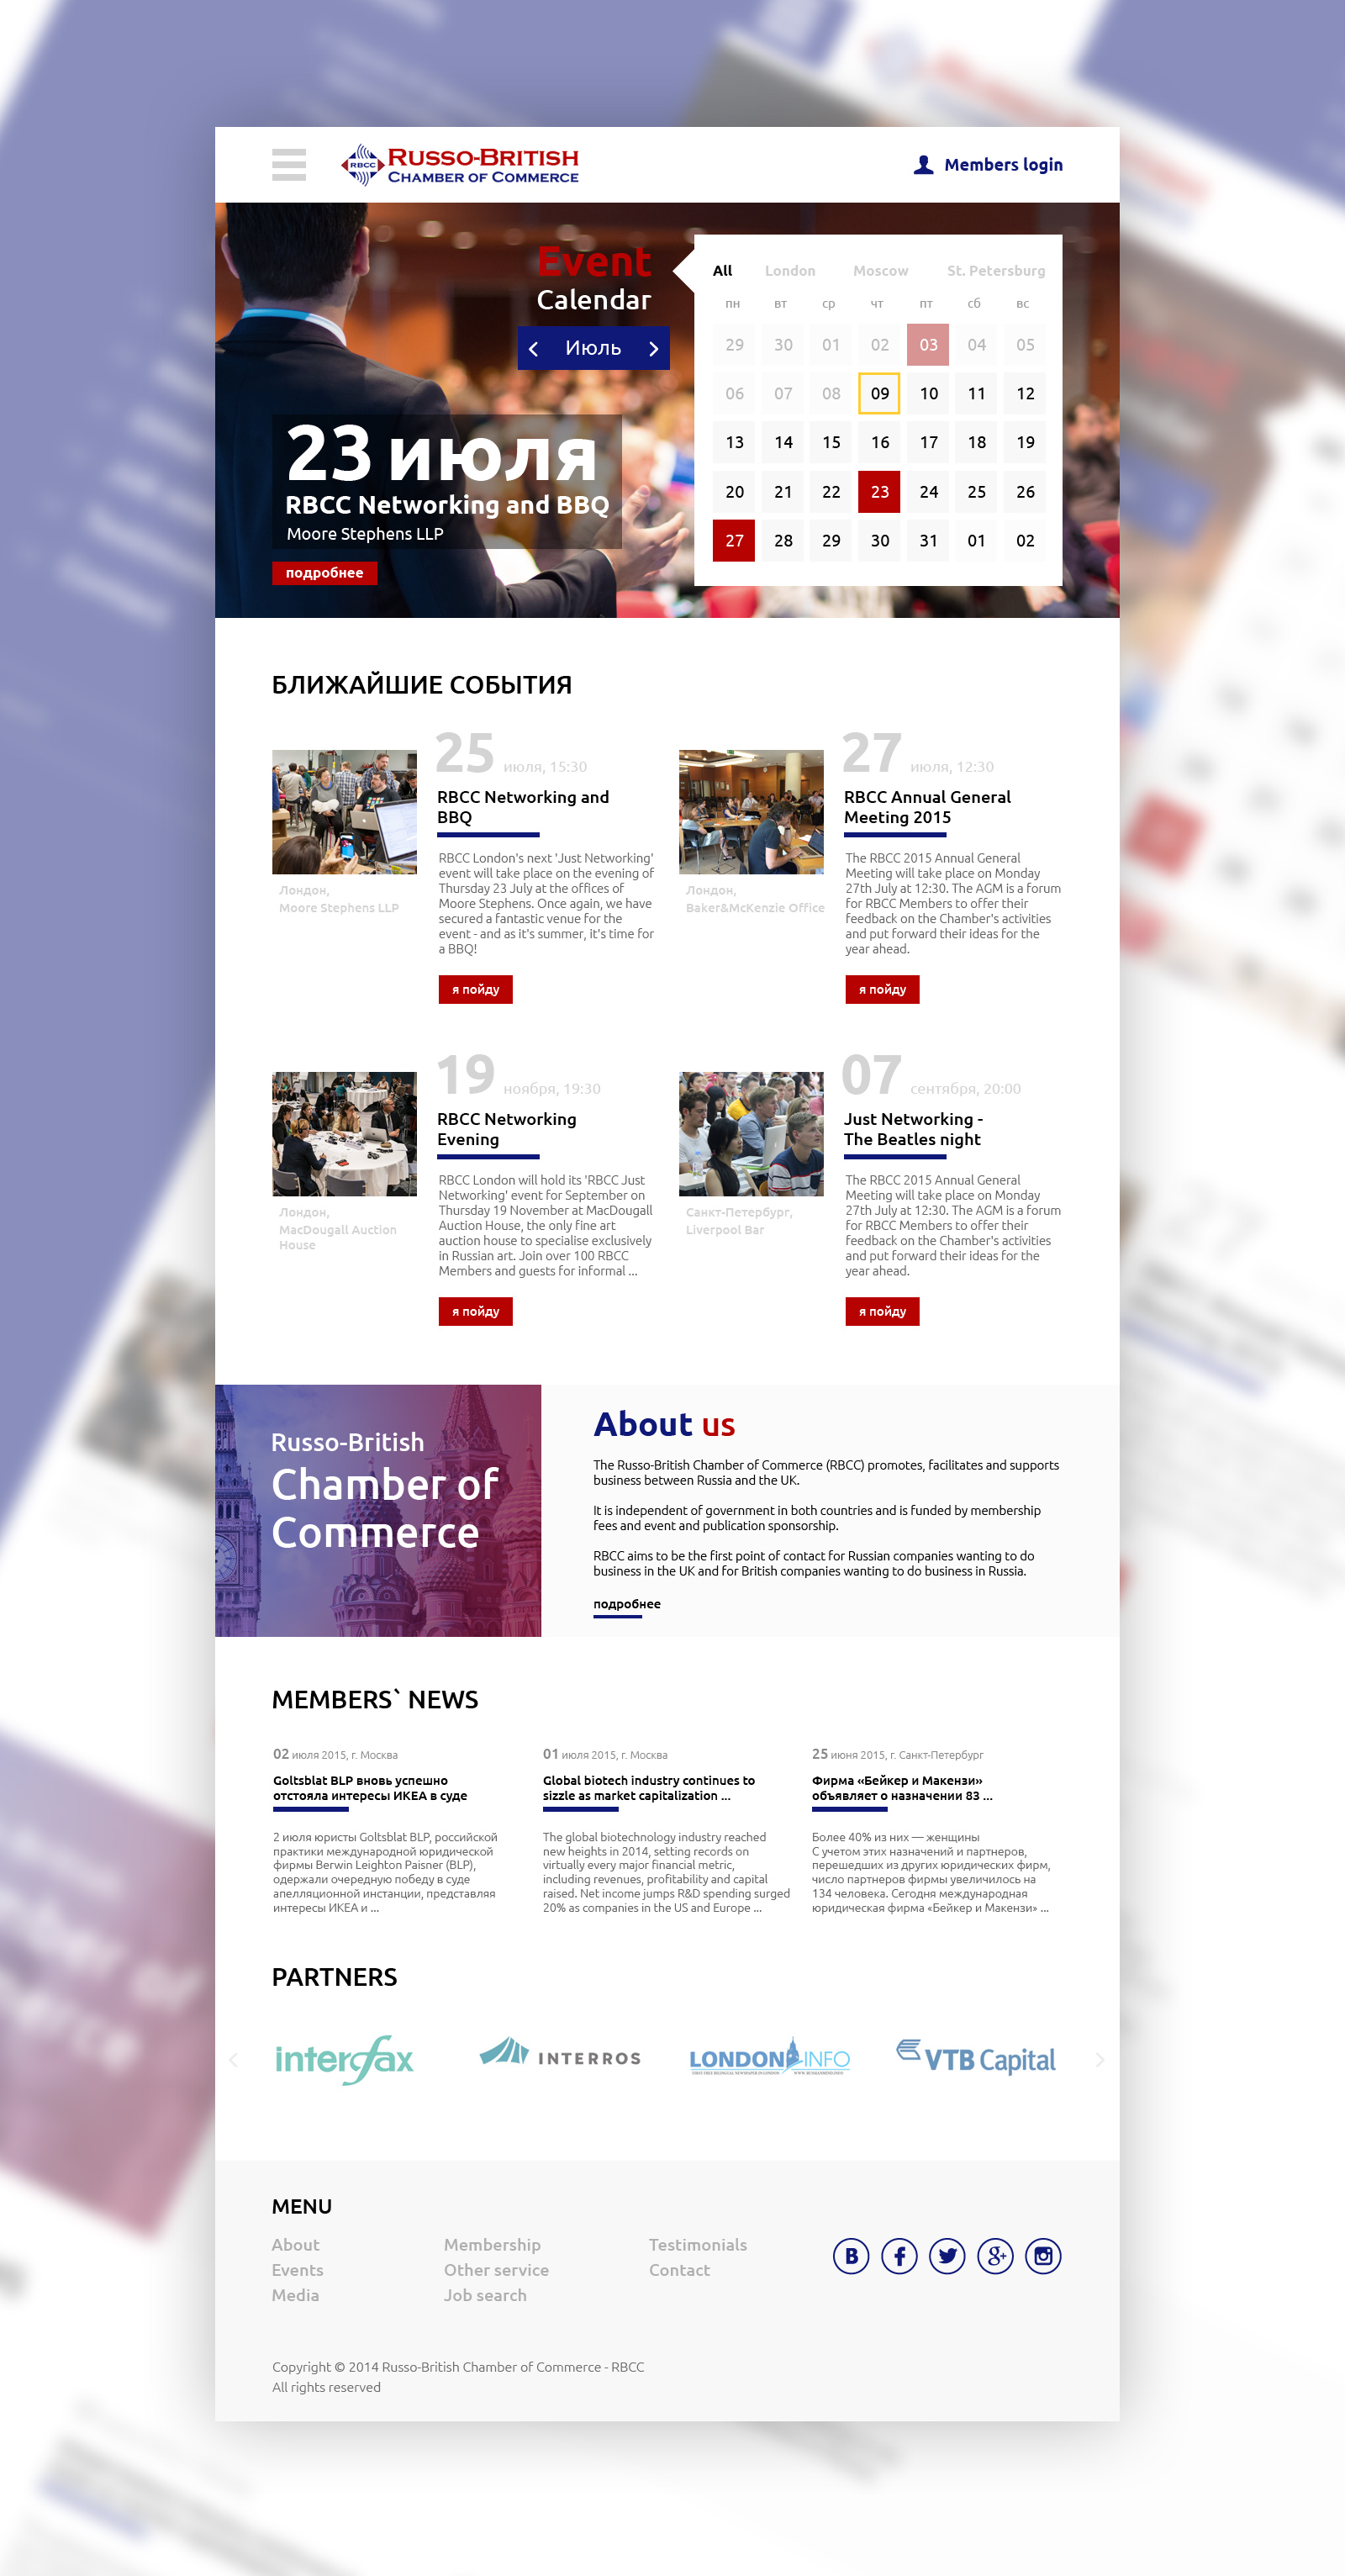 Russo-British Chamber of Commerce